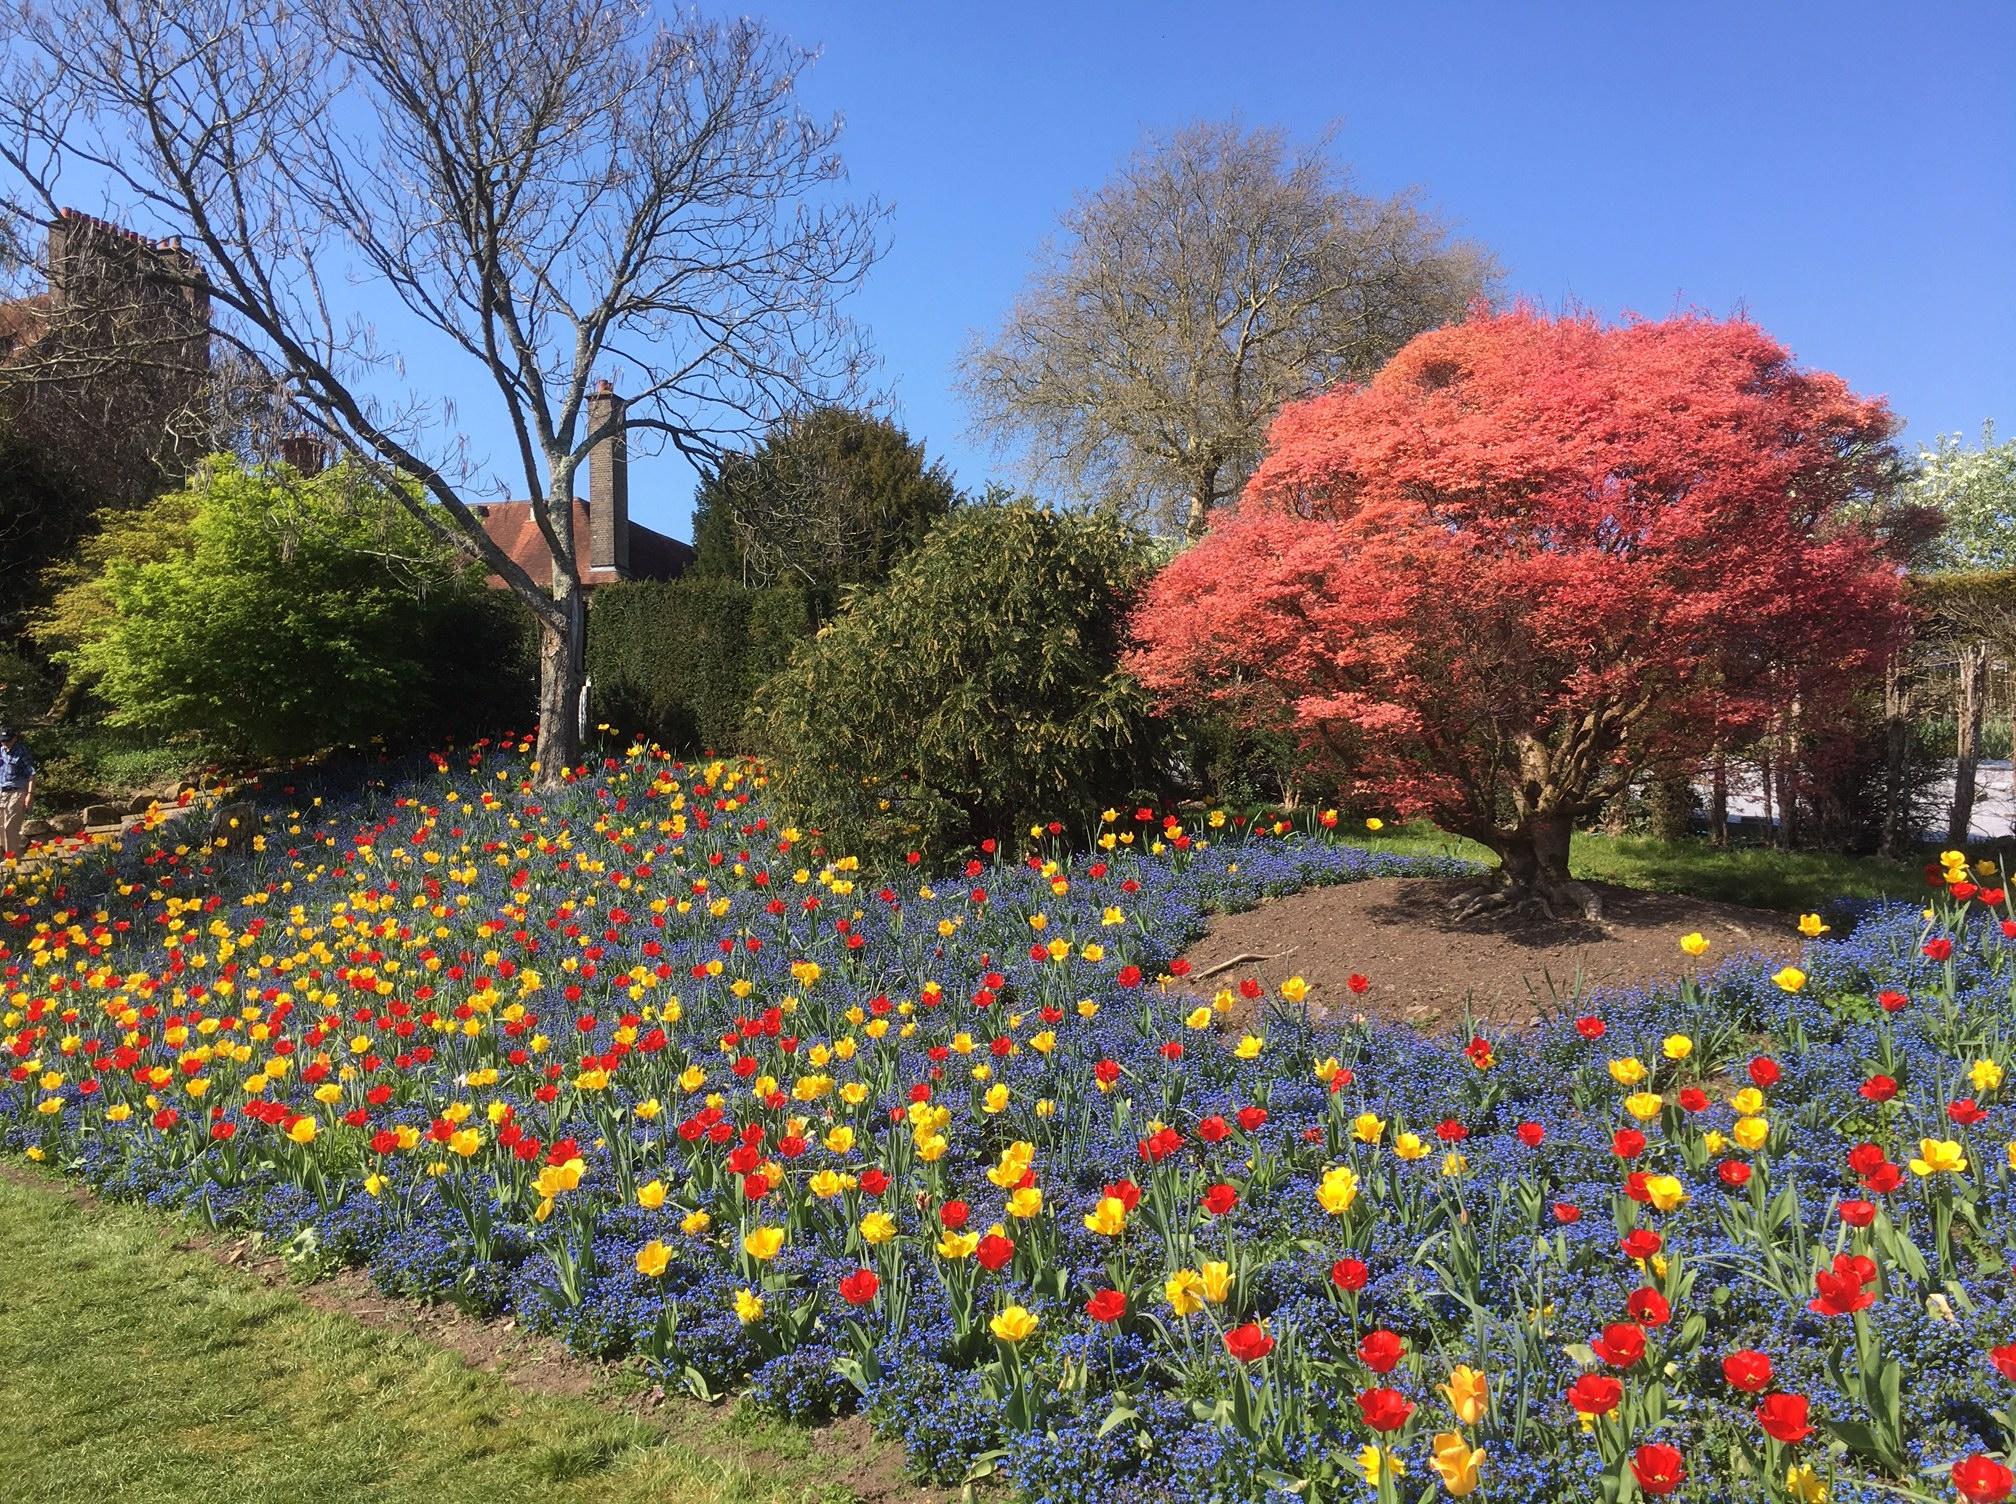 Standen technicolour tulips 2019